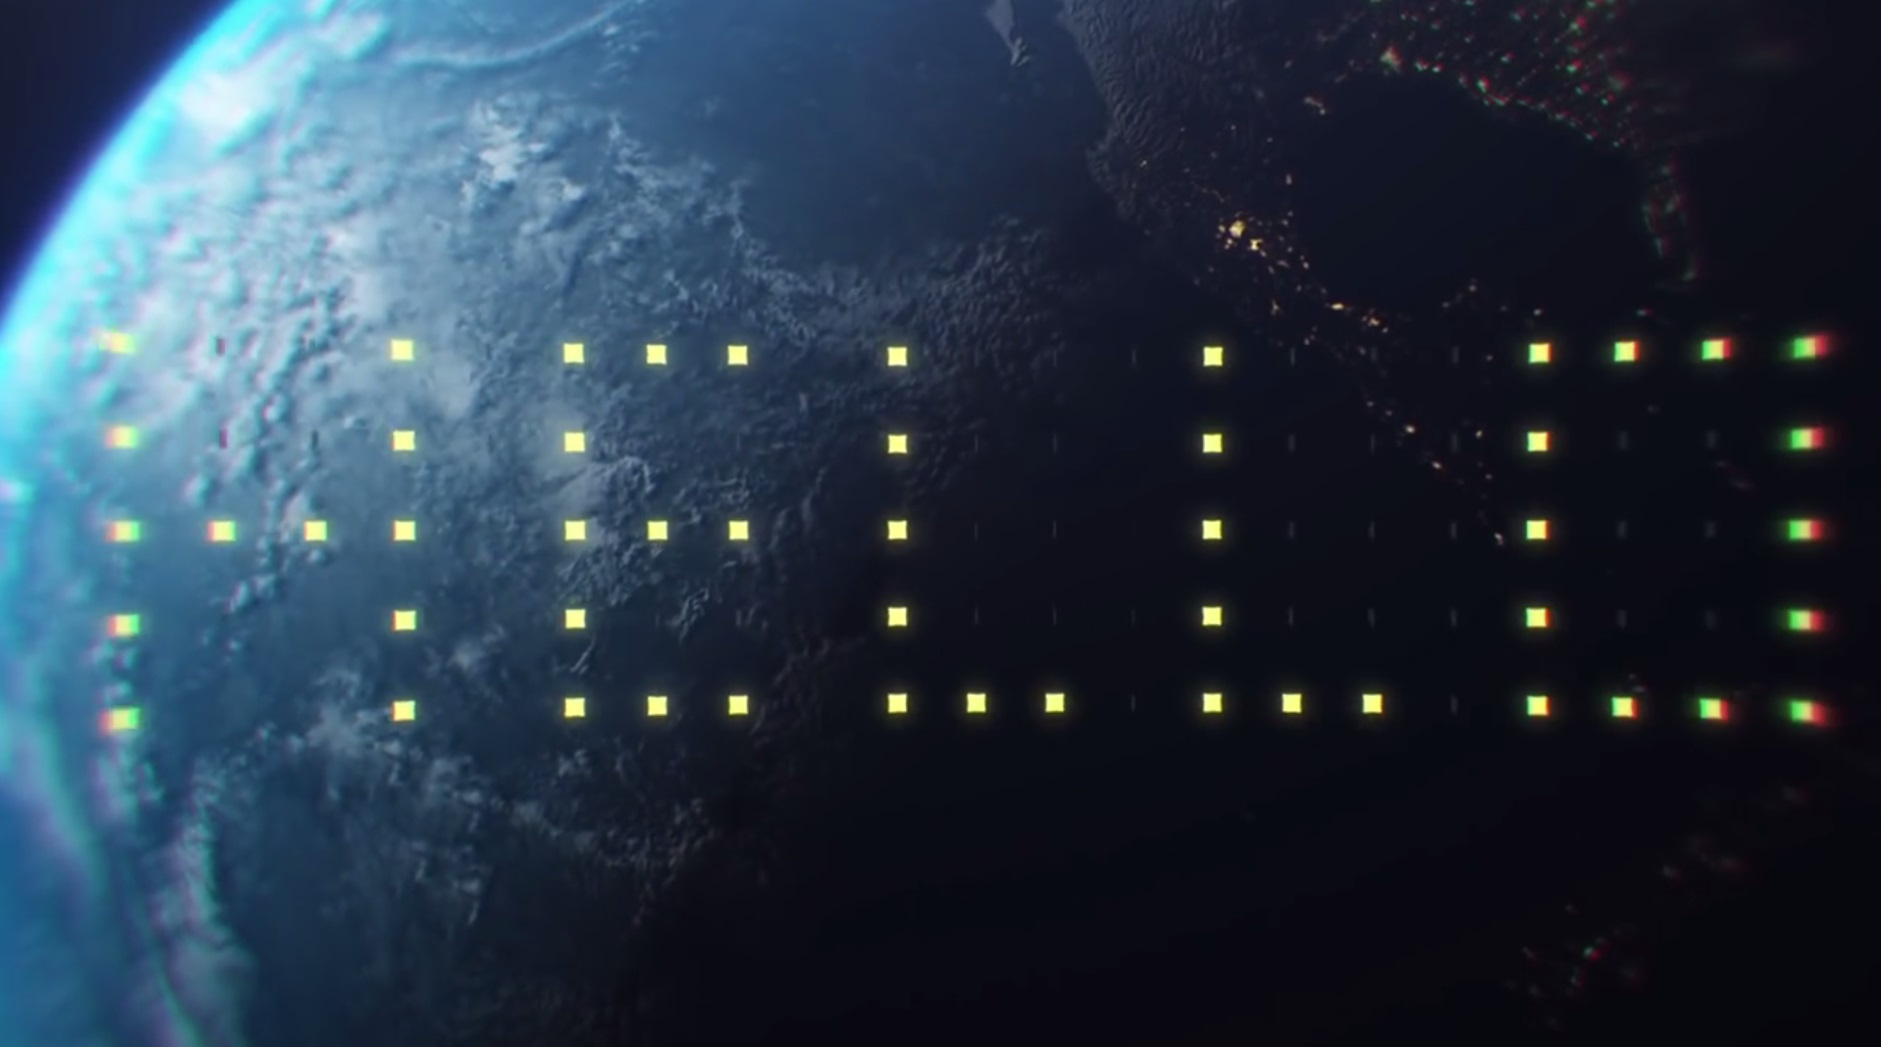 Облачно, вероятна неотключаемая реклама на звездном небе - 15